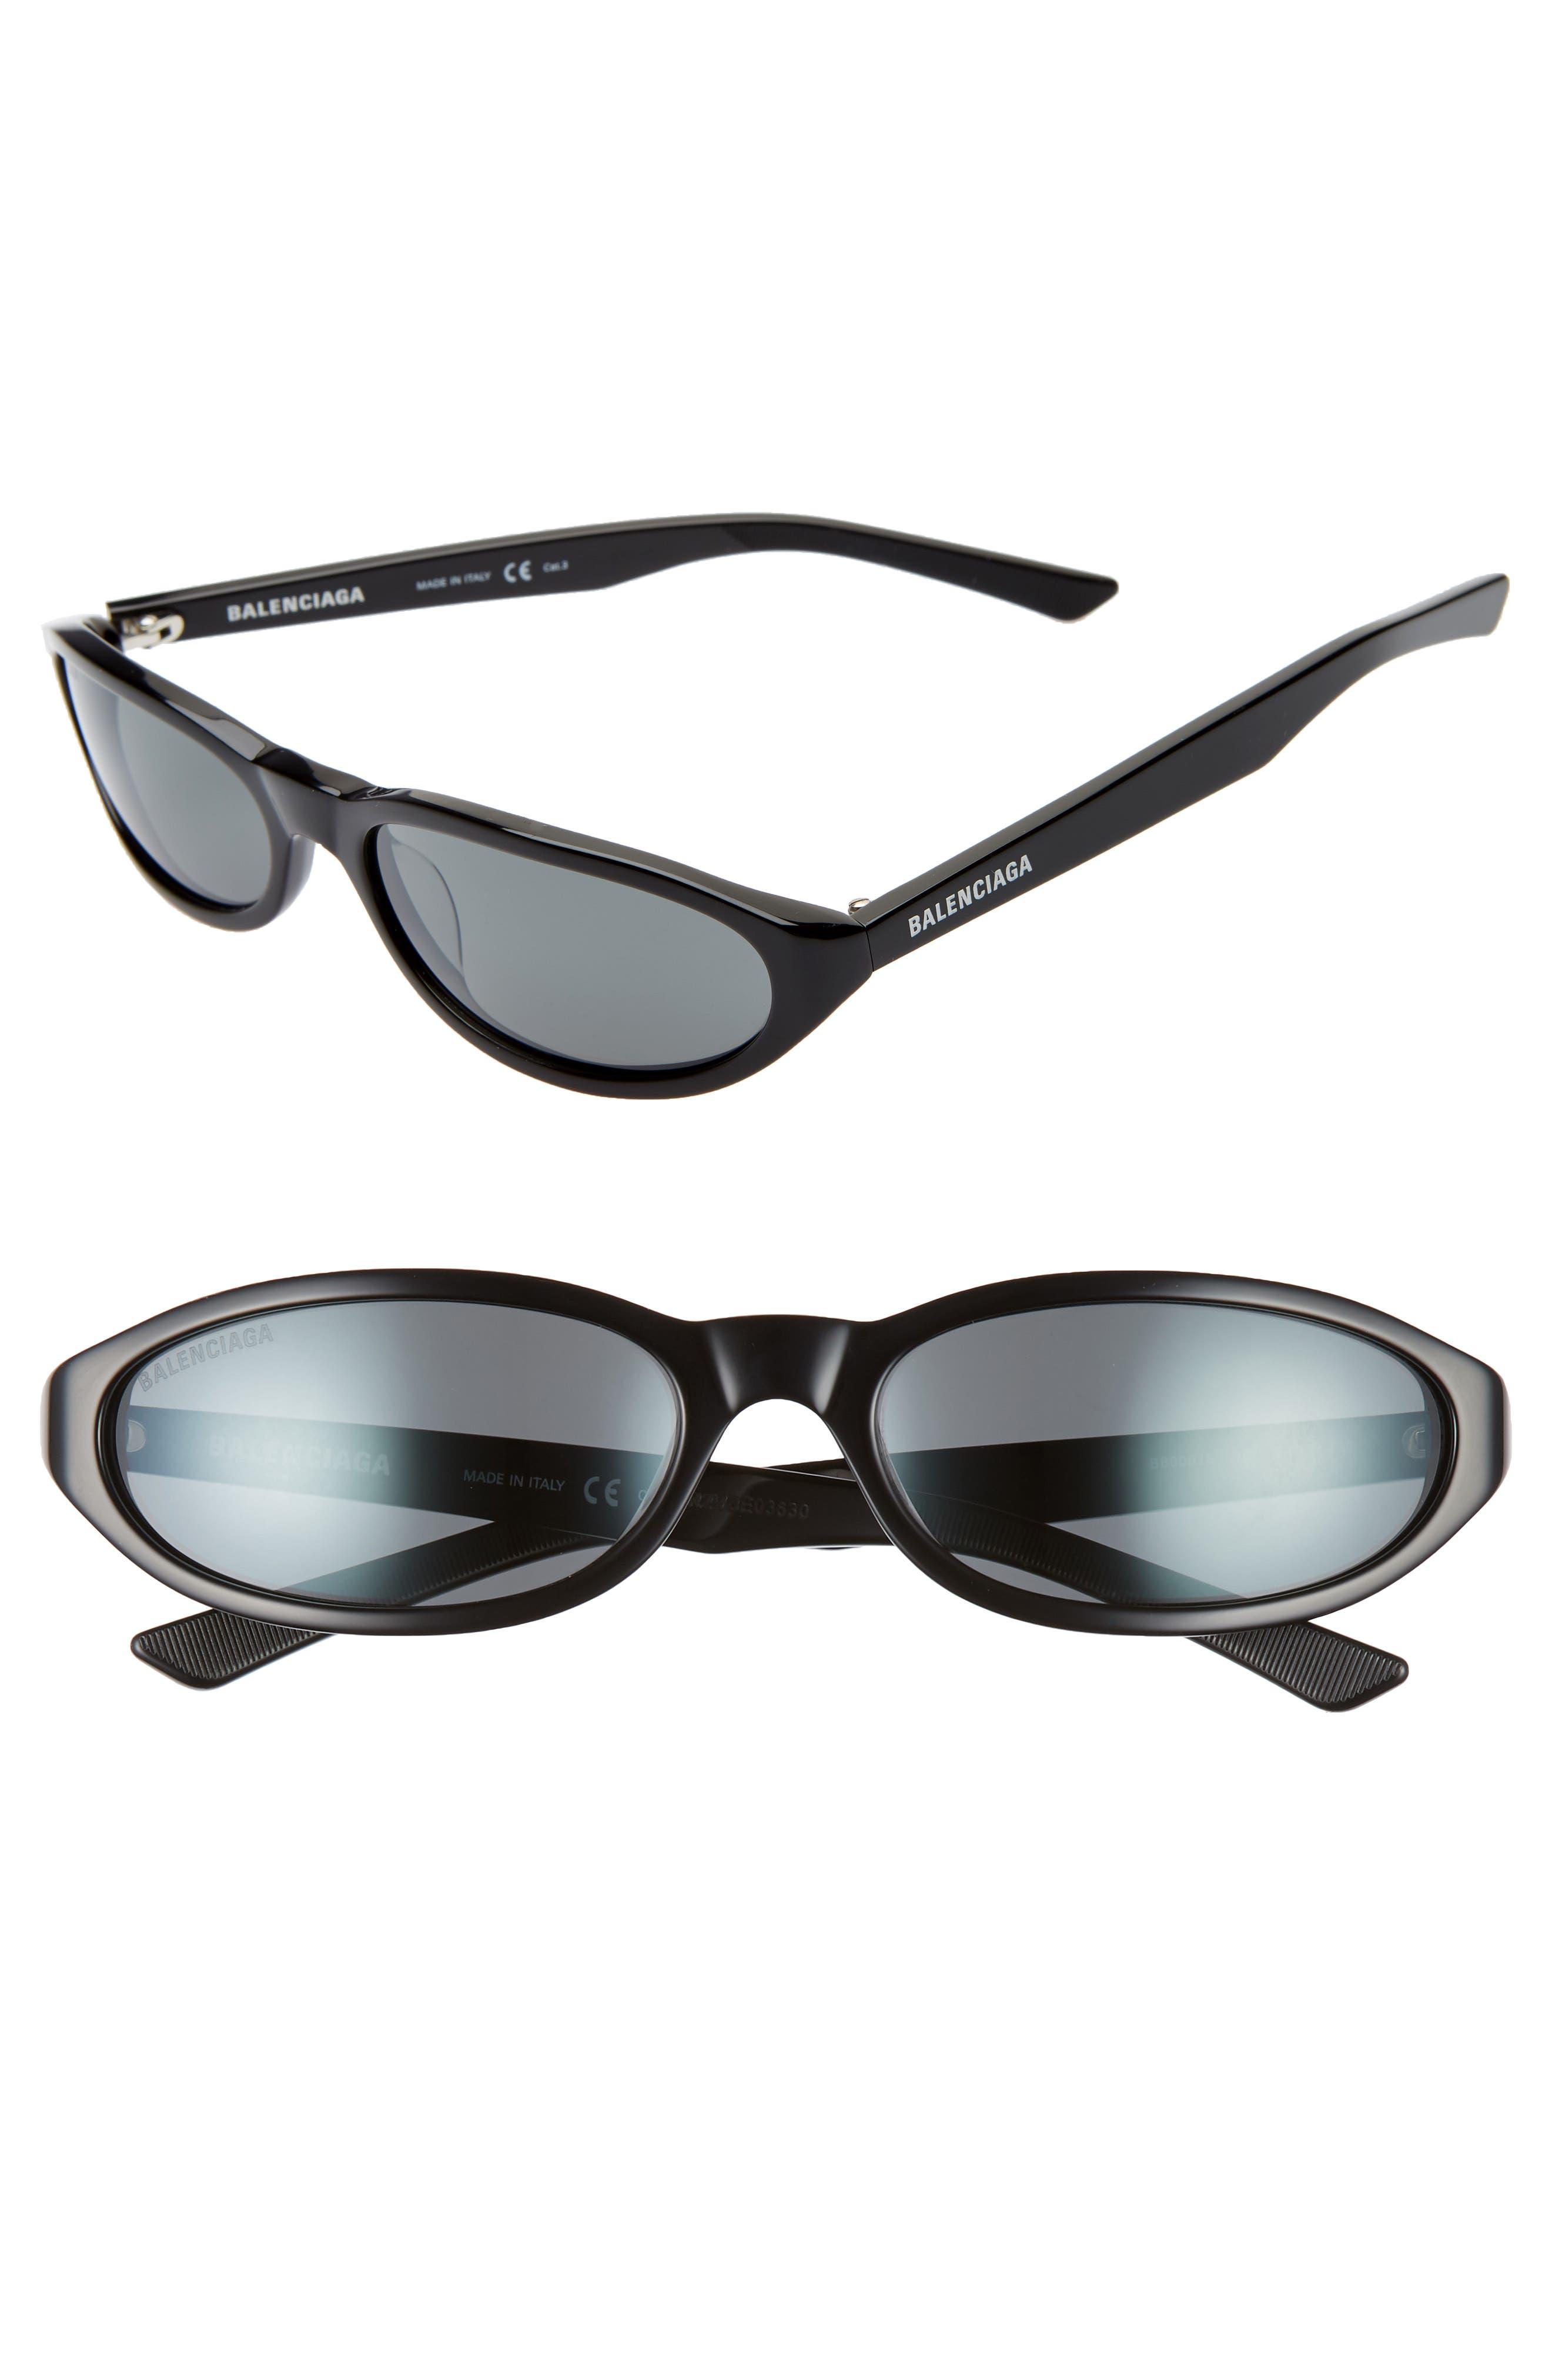 BALENCIAGA, 59mm Cateye Sunglasses, Main thumbnail 1, color, SHINY BLACK/ GREY